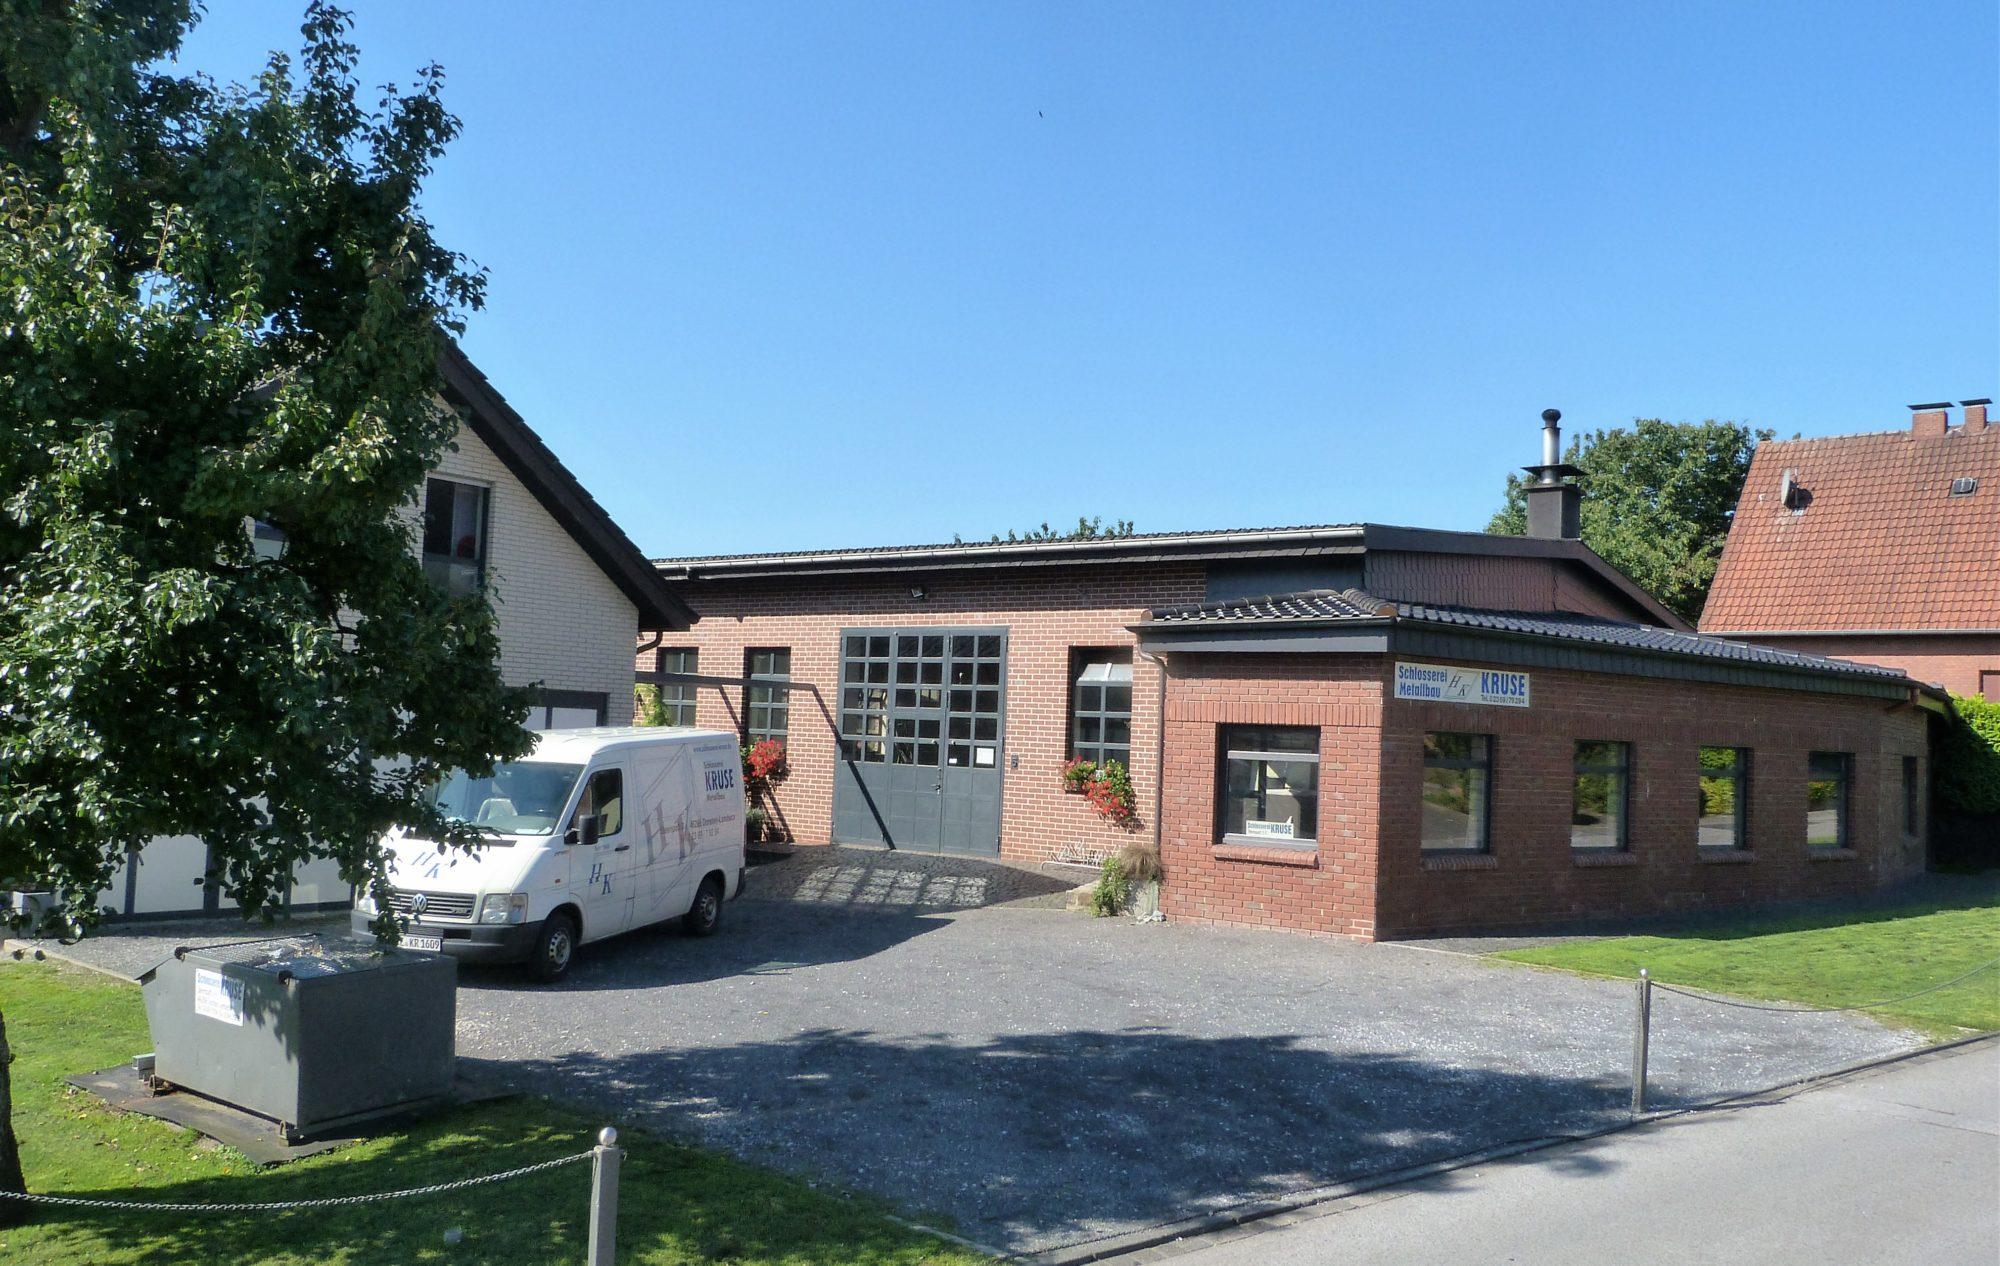 Schlosserei Kruse